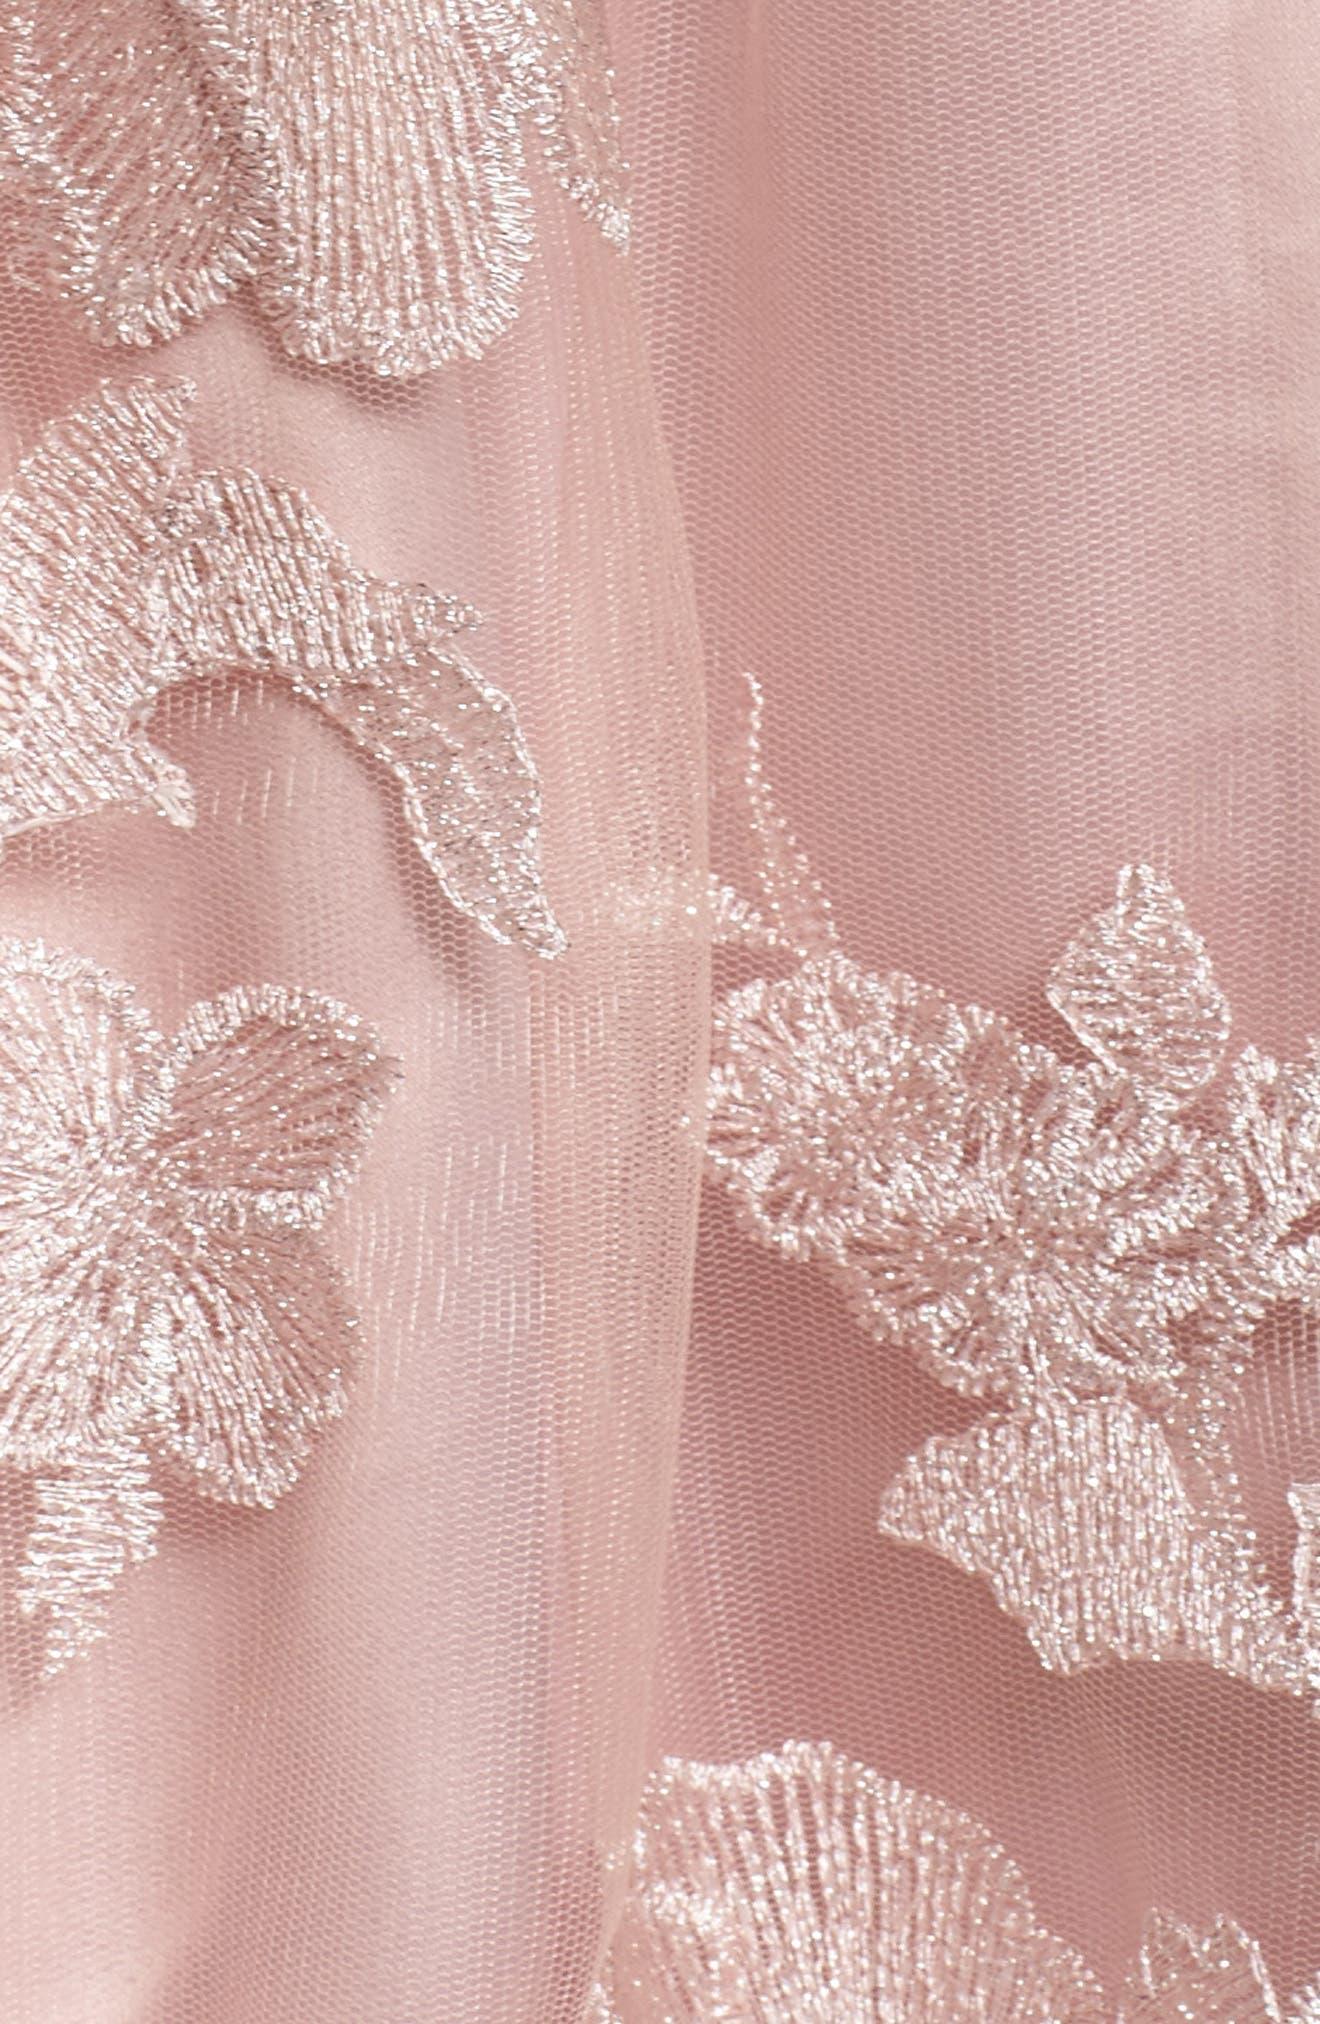 ELIZA J, Floral Embroidered Skirt, Alternate thumbnail 5, color, 254